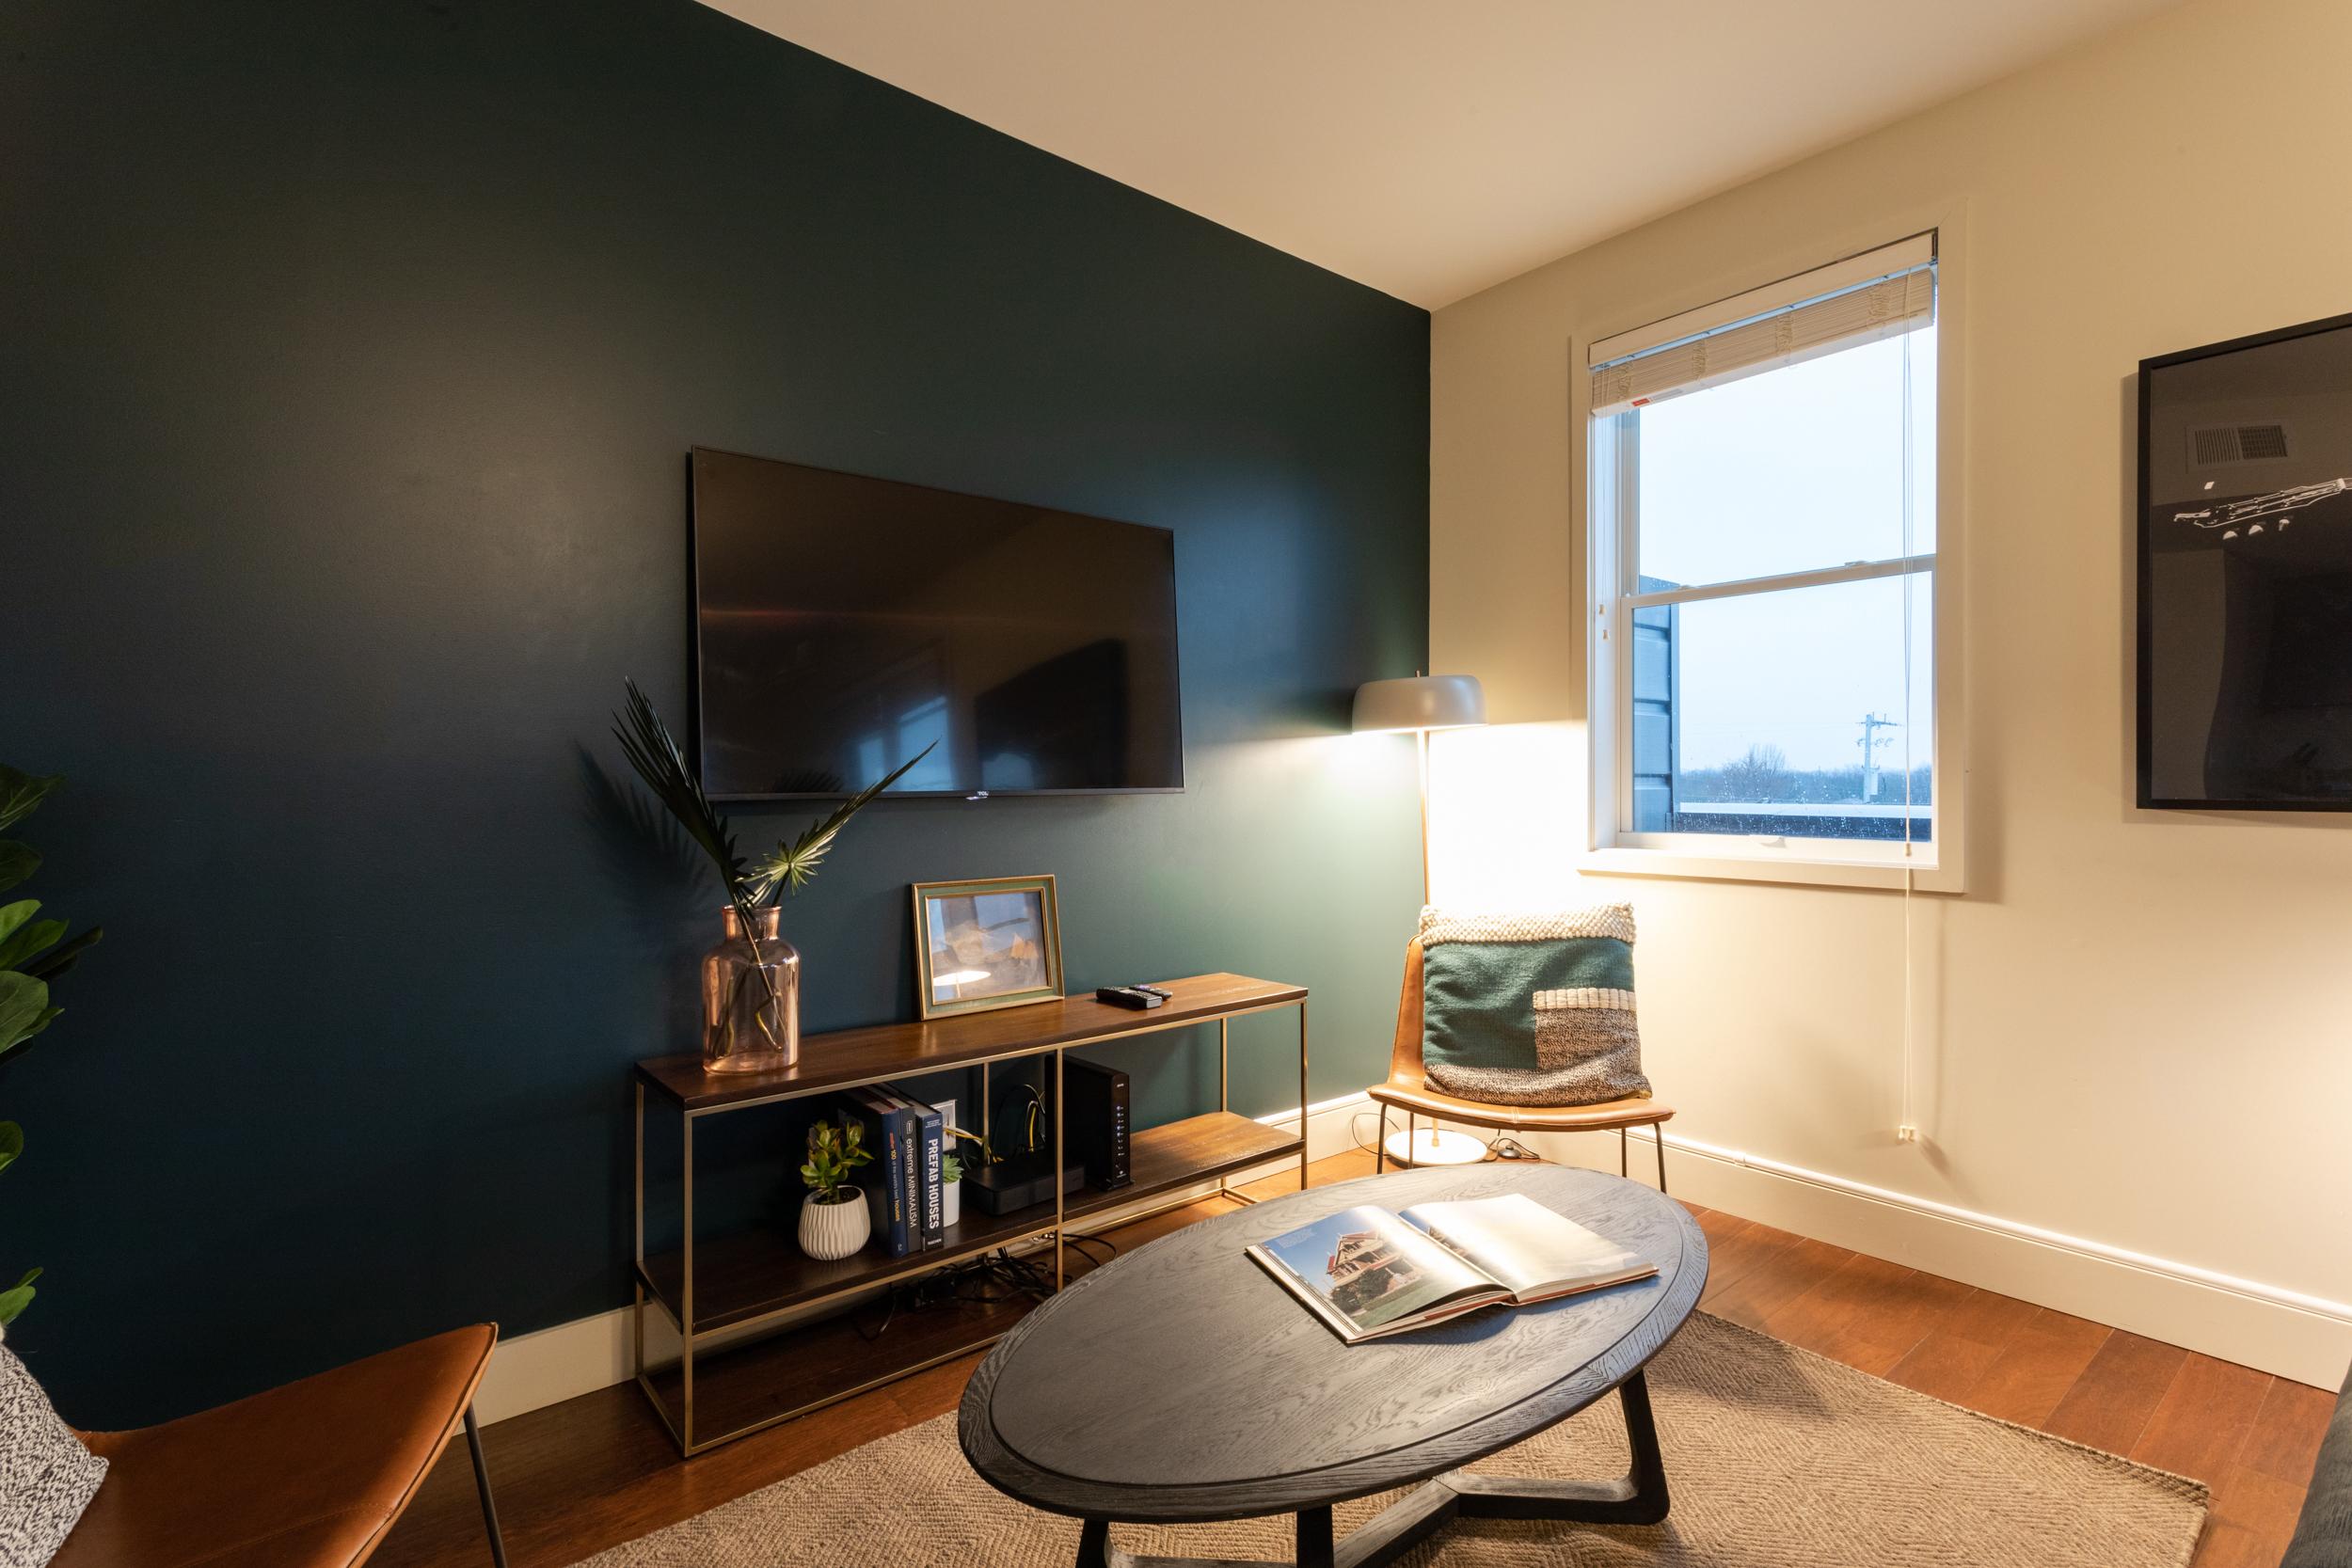 12 South Airbnb-80.jpg